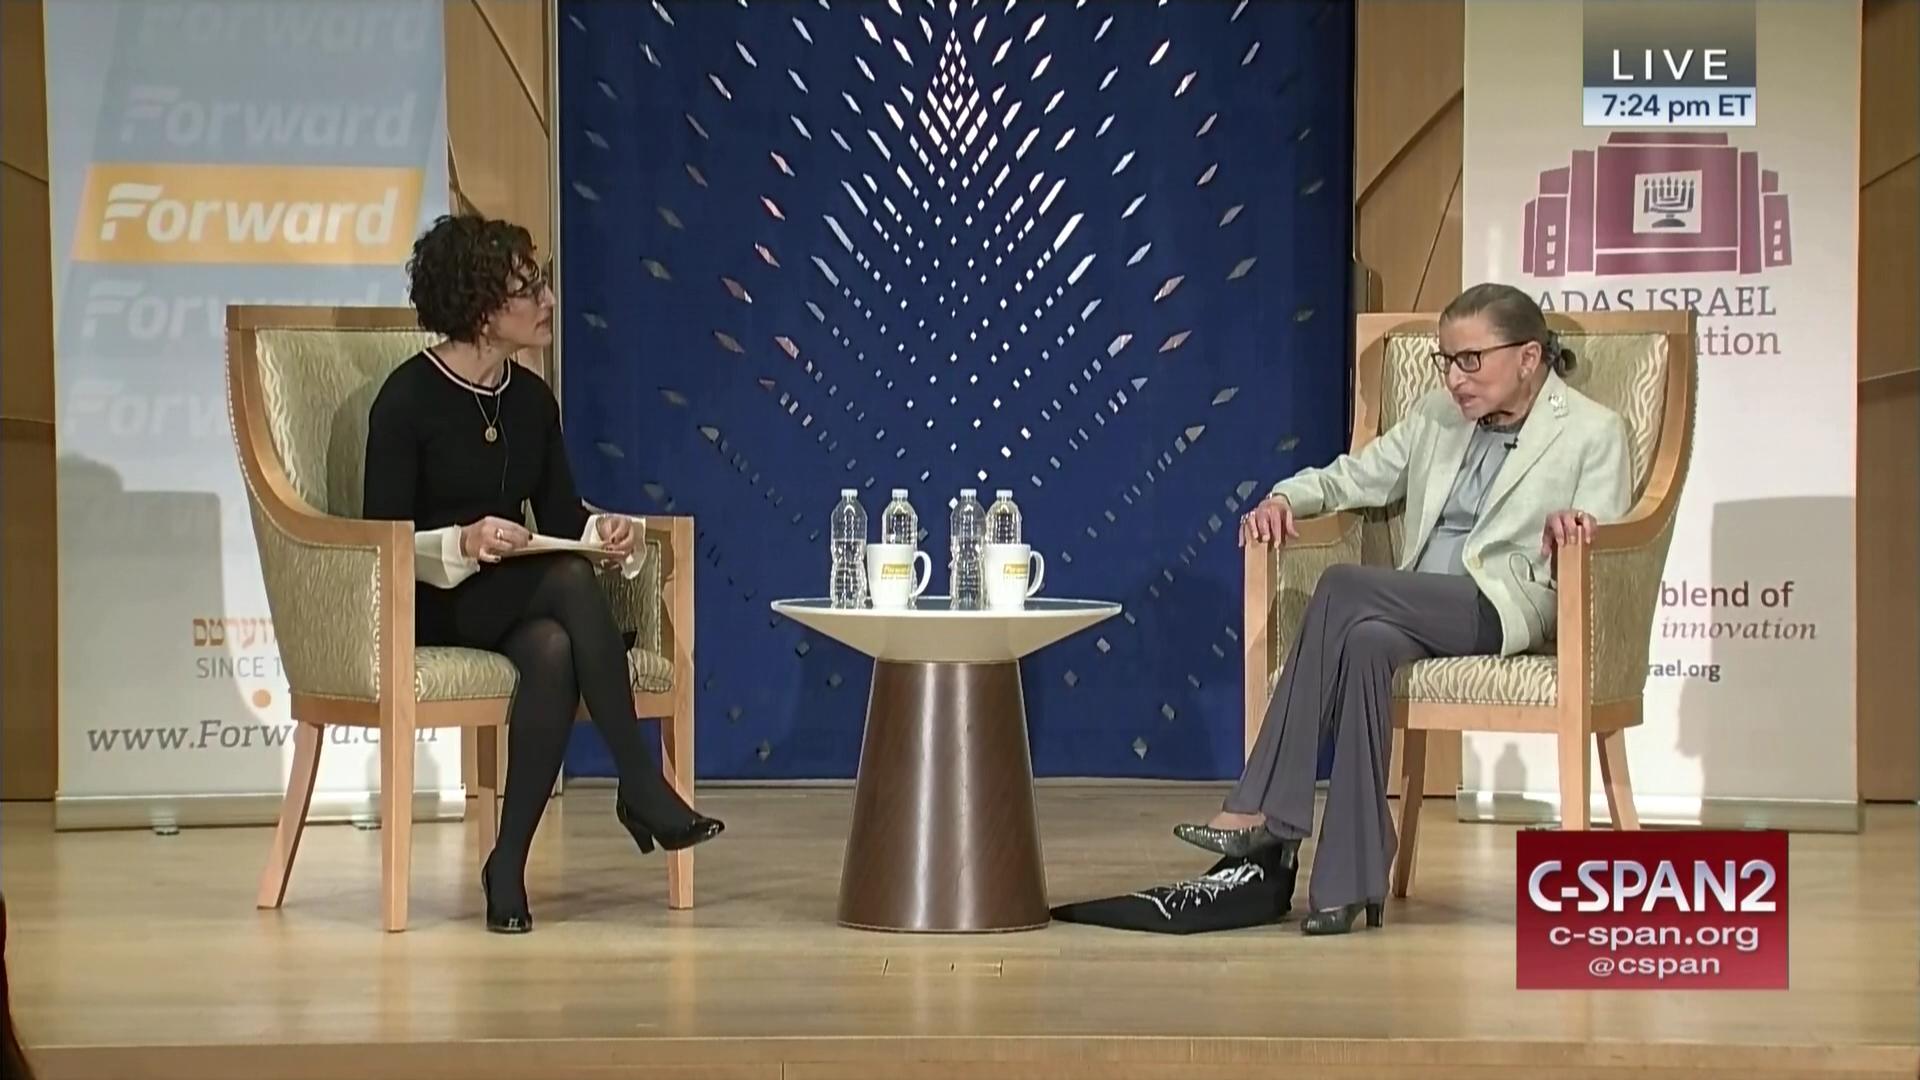 Justice Ginsburg Discusses Law Media Jewish Life Feb 1 2018